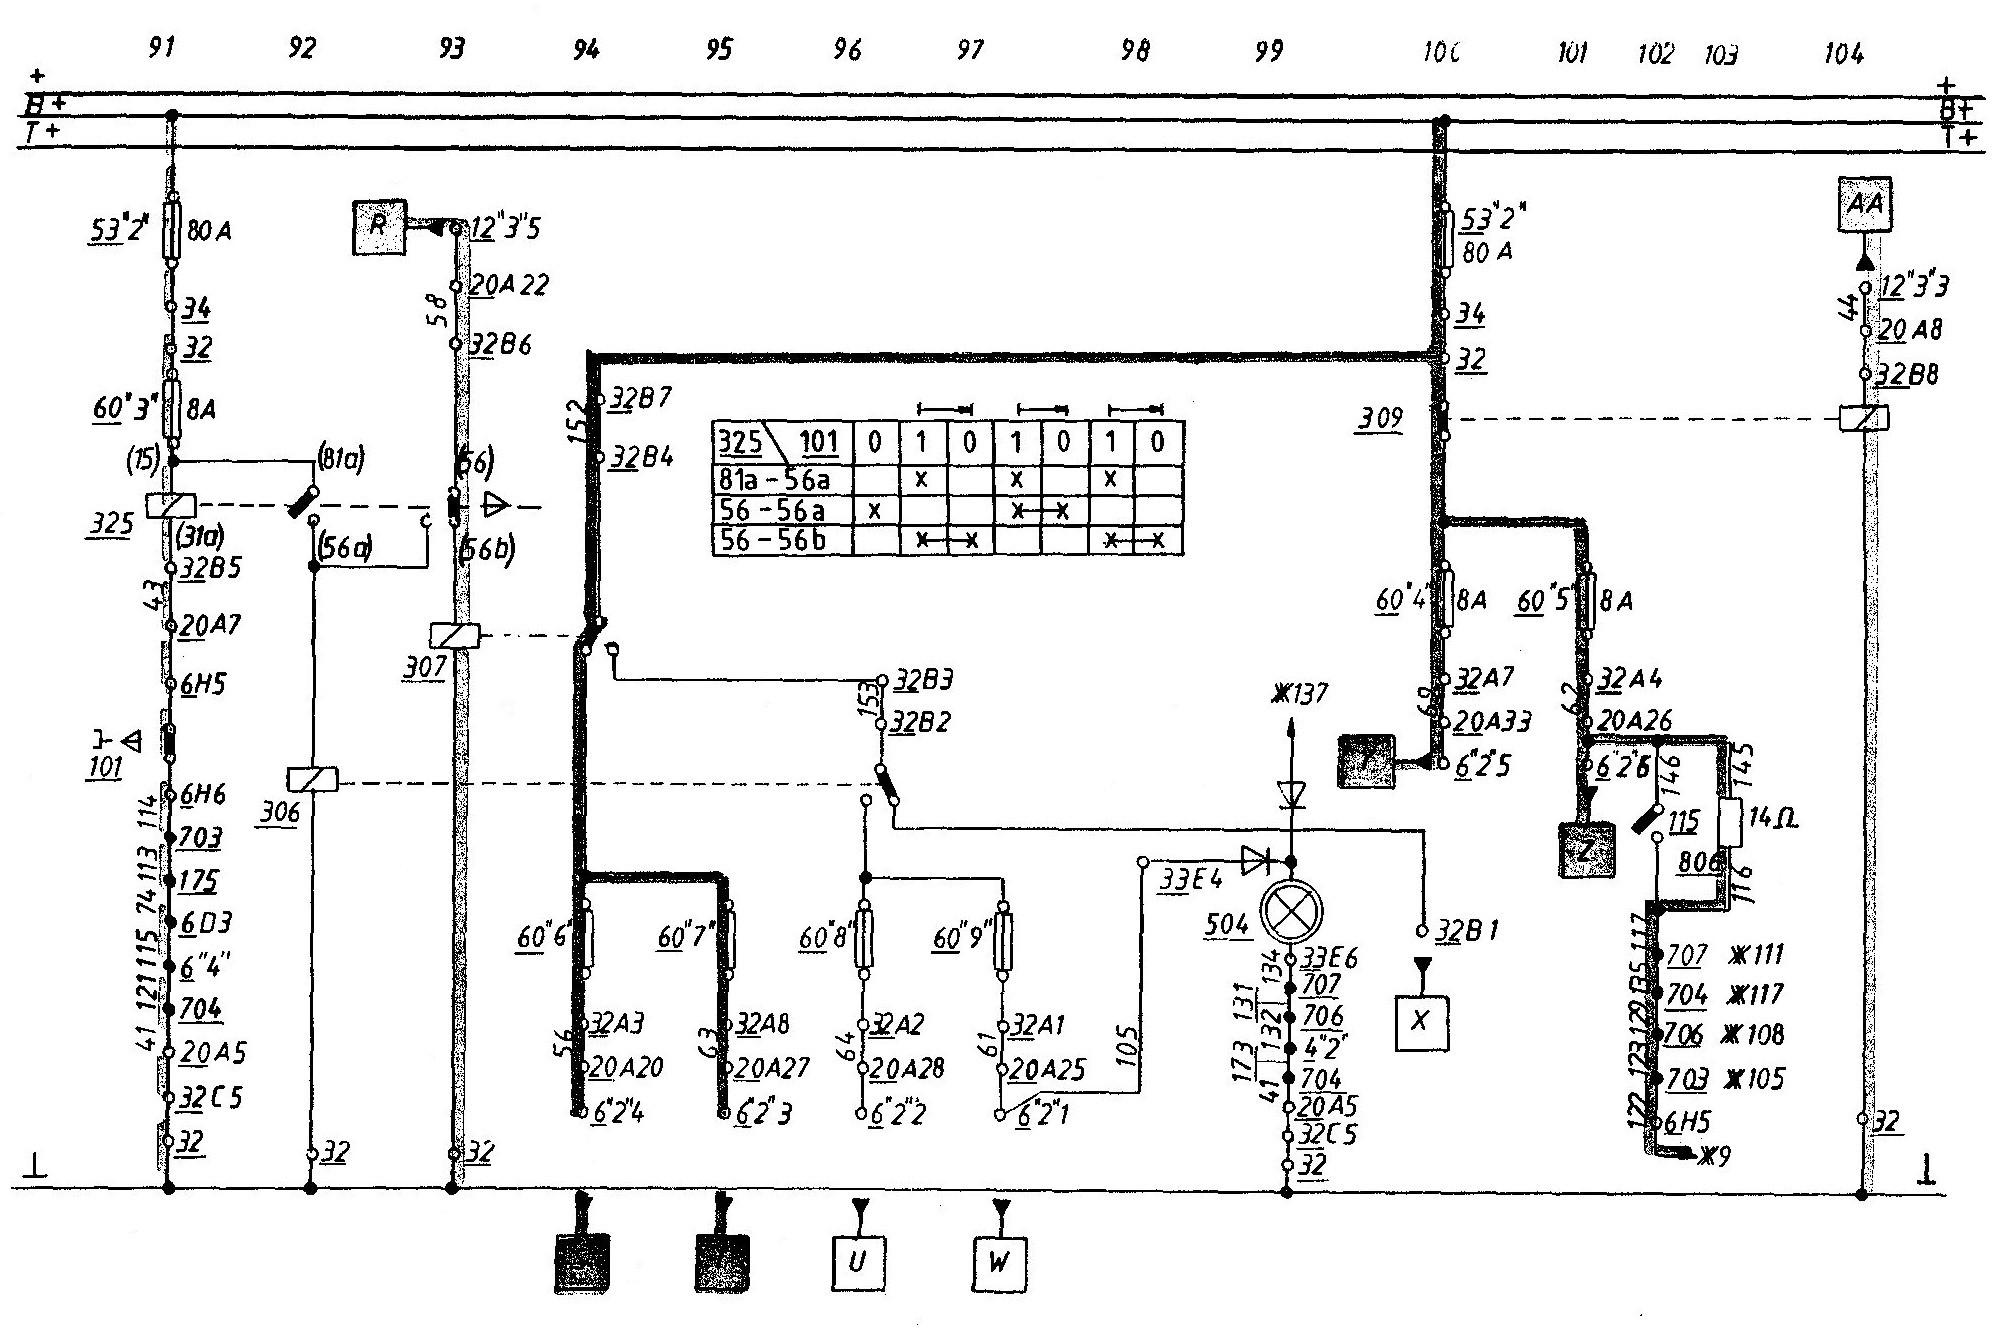 Light Wiring Diagram Unique Light Wiring Diagram Diagram Of Light Wiring Diagram